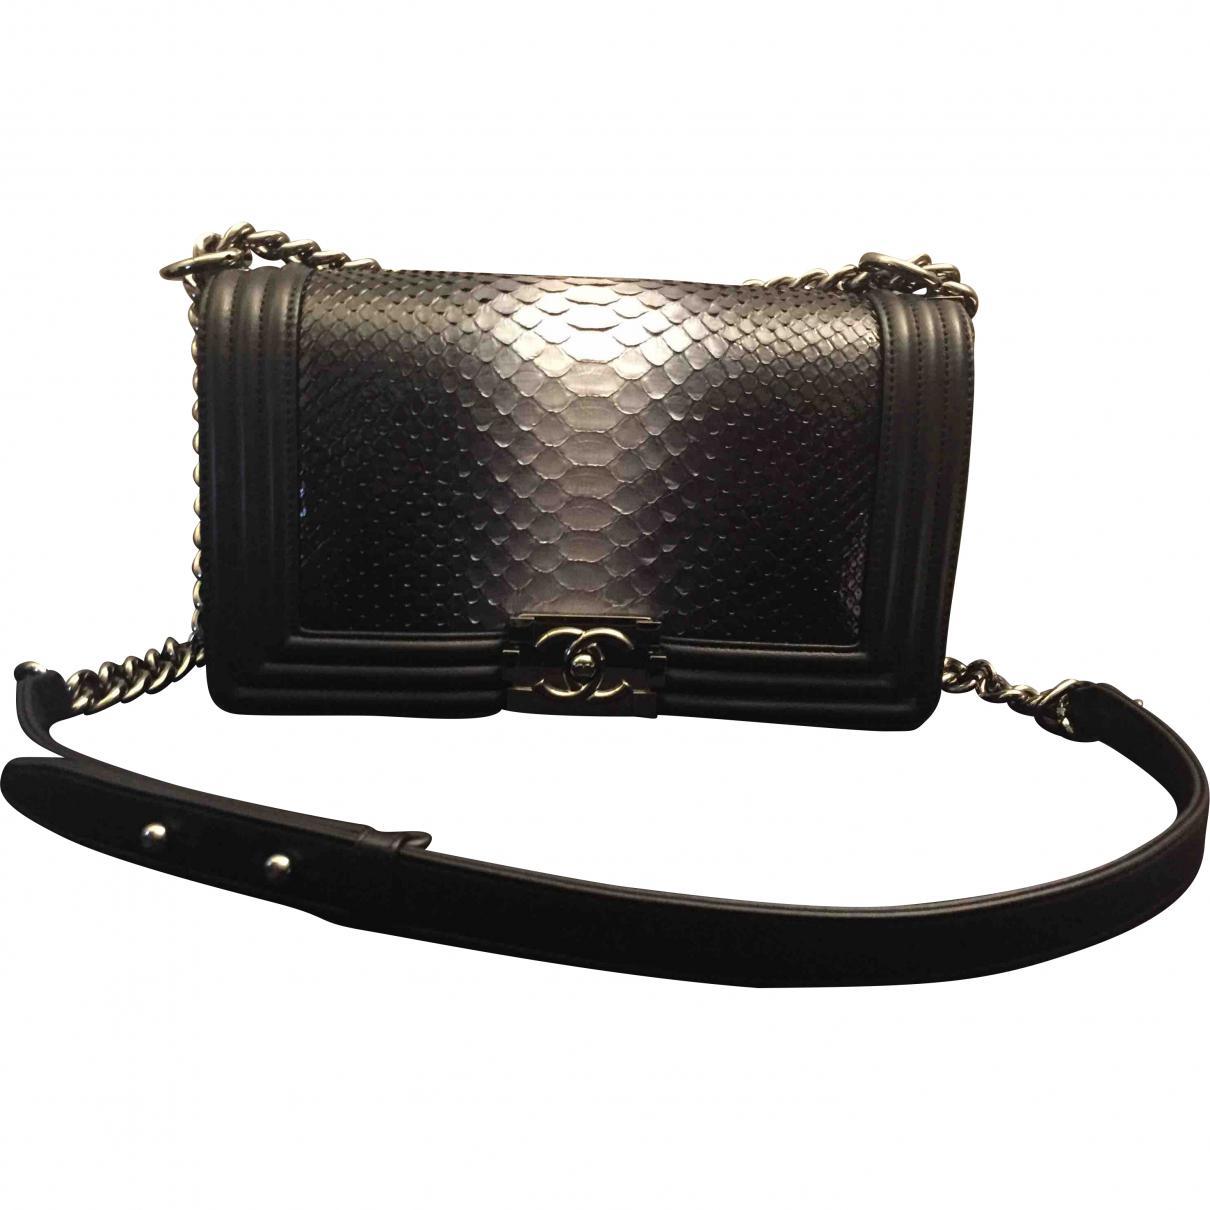 788964026fe8 Chanel Pre-owned Boy Python Bag in Black - Lyst